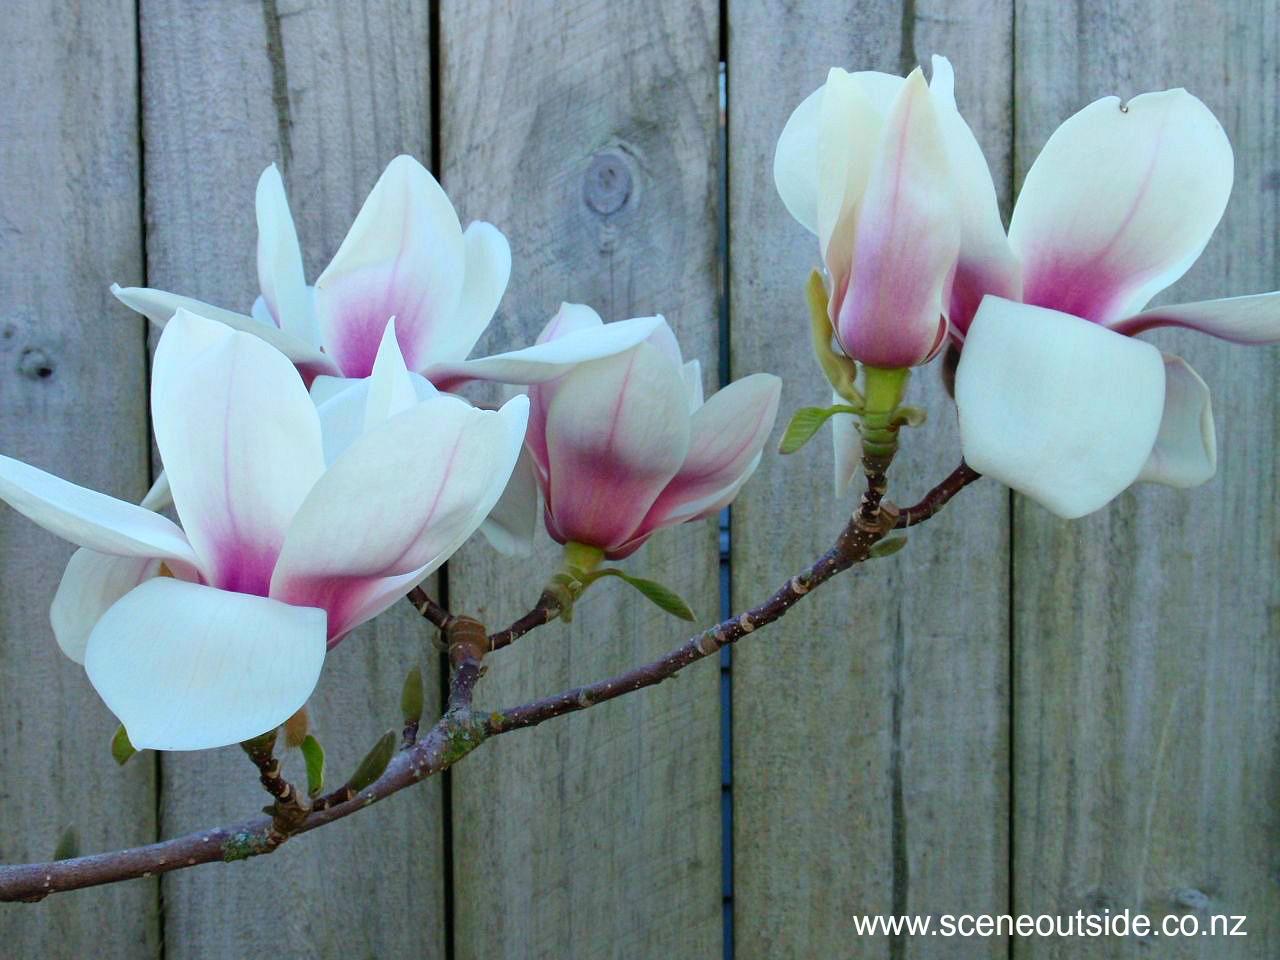 About Garden Design Magnolia Athene